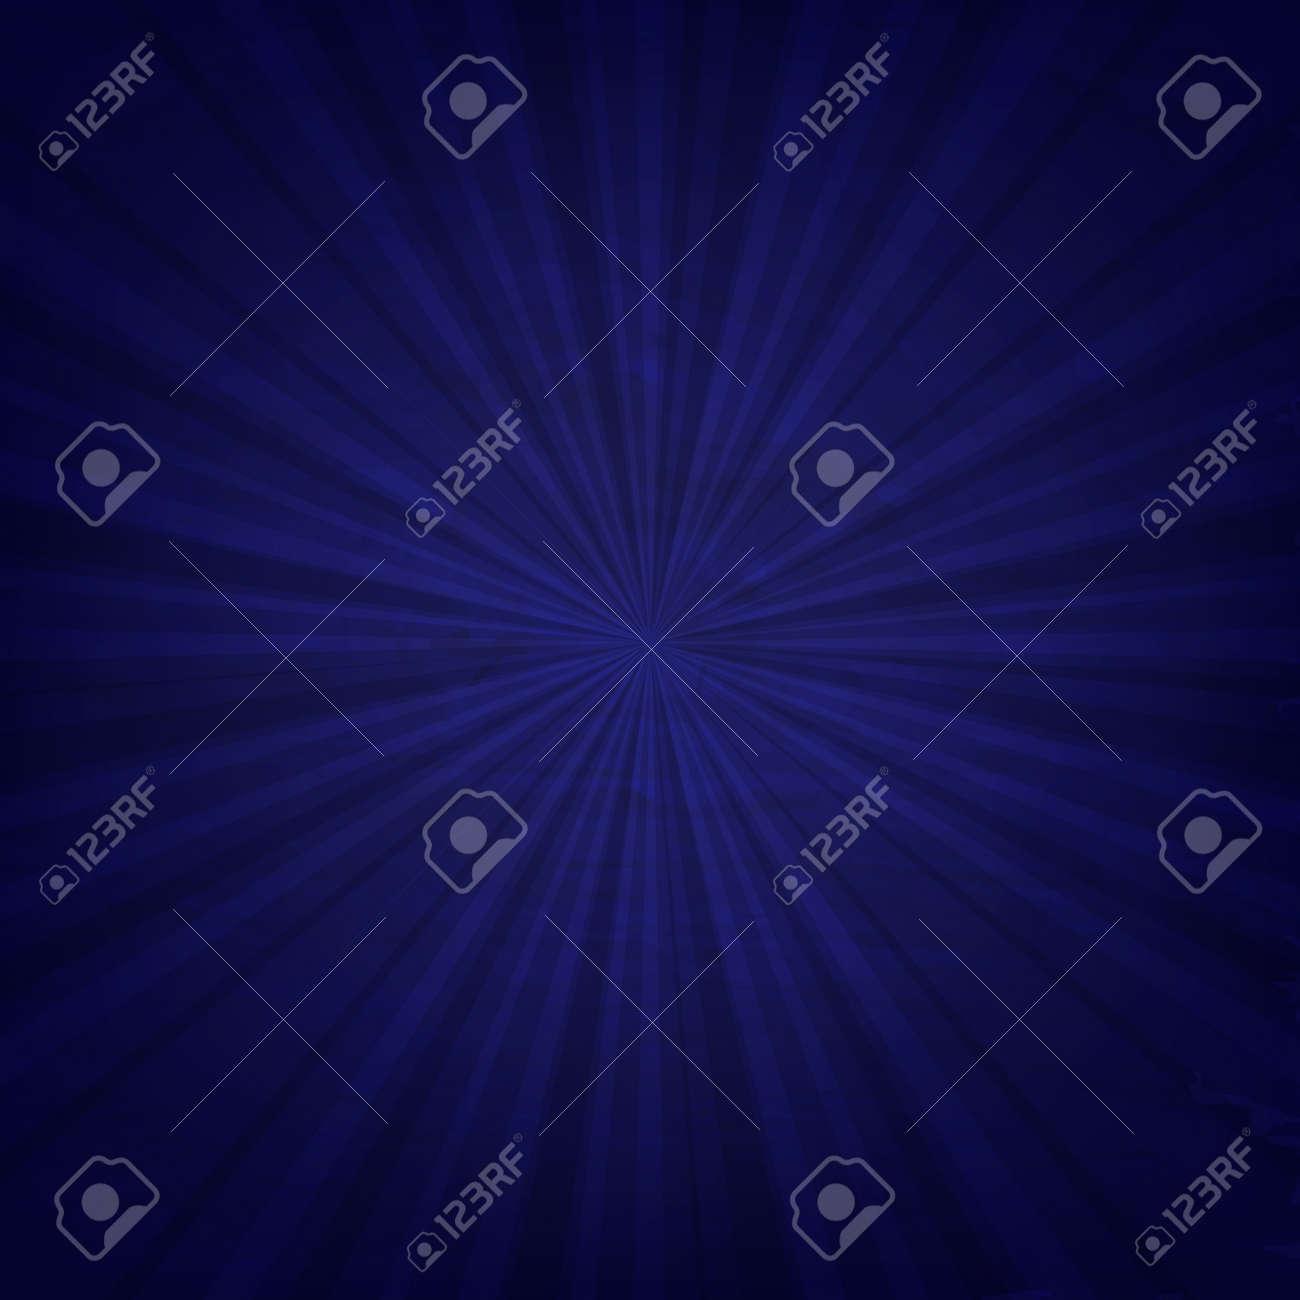 Vintage Blue Sunburst Poster With Gradient Mesh, Vector Illustration - 34581751